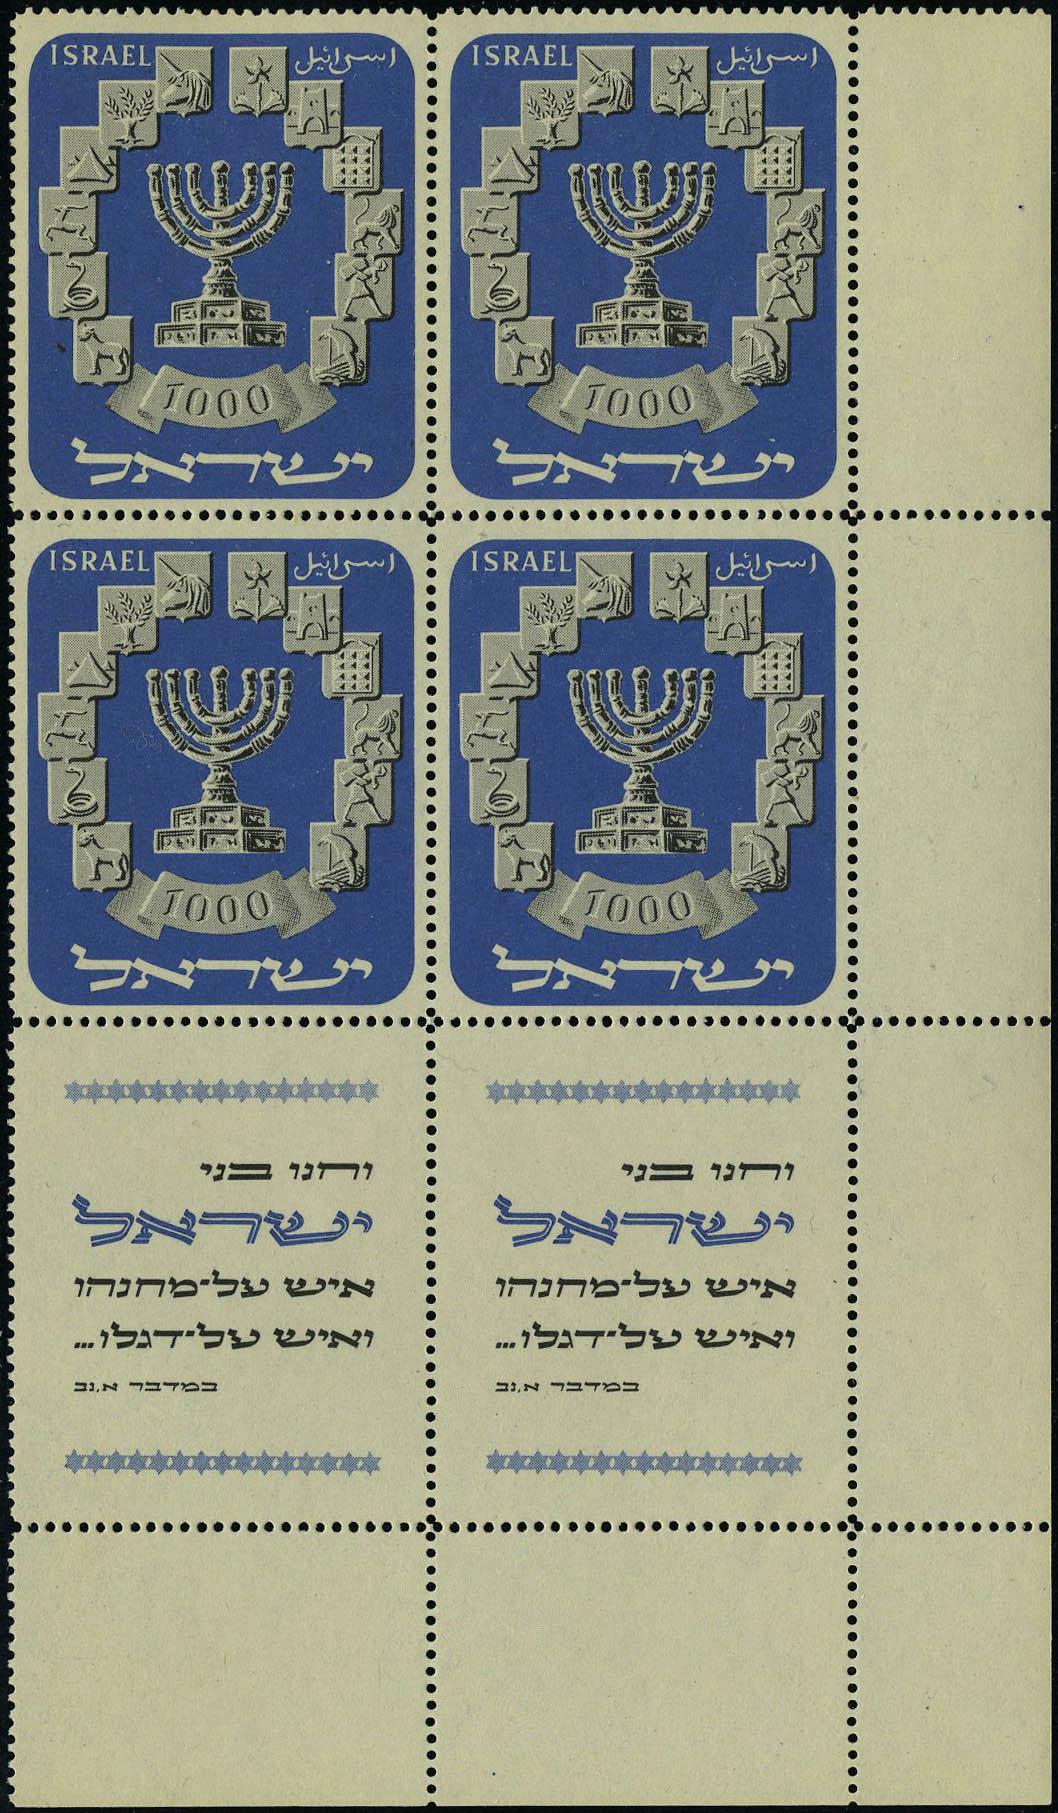 Lot 3337 - Israel  -  Francois Feldman F.C.N.P François FELDMAN sale #127